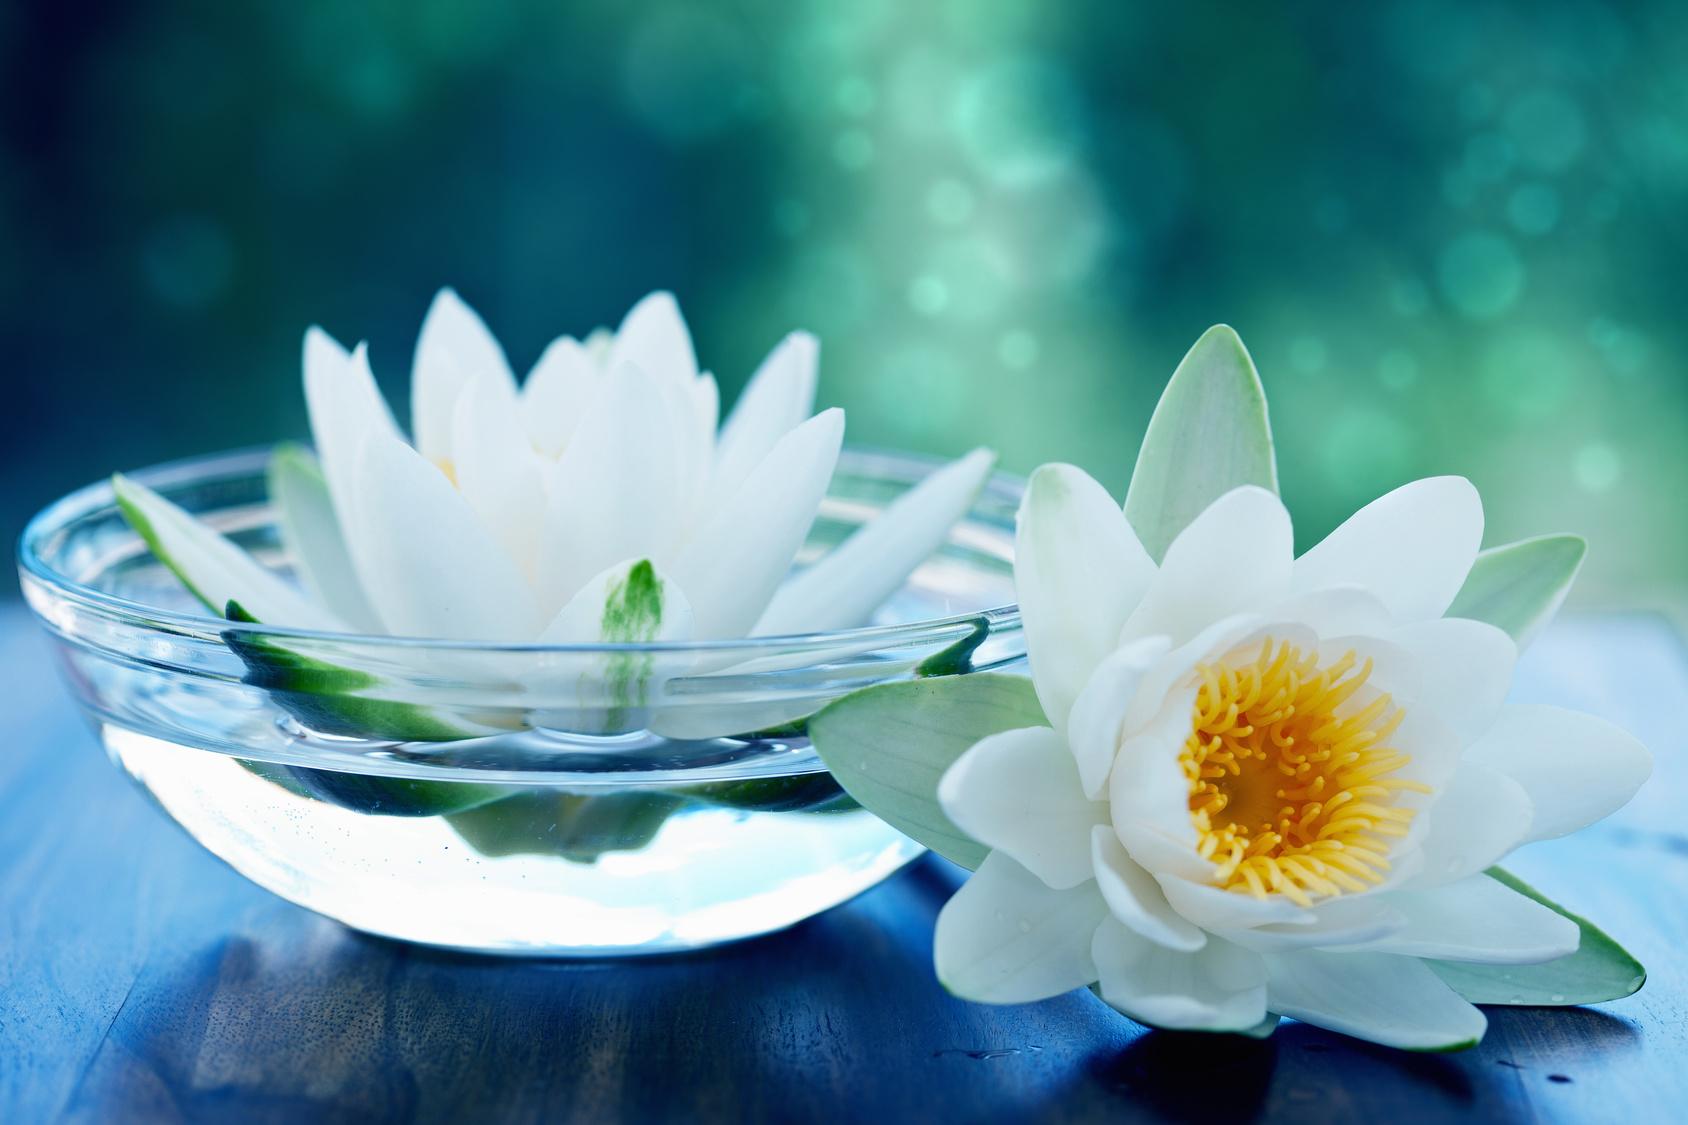 10 Keys to Trusting Divine Guidance